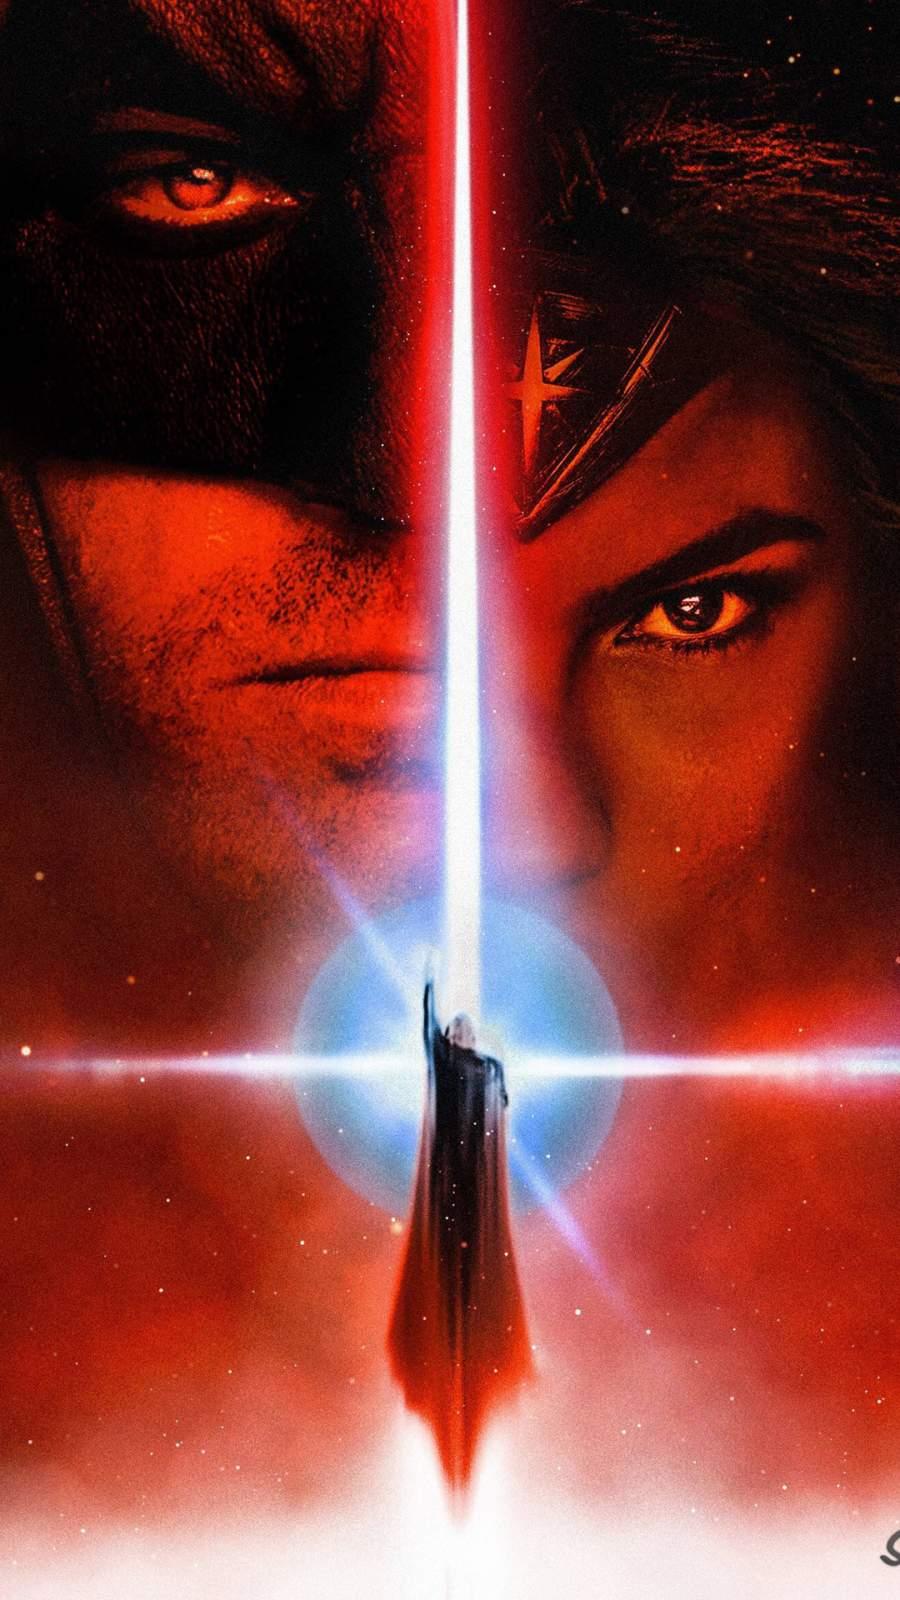 Batman Wonder Woman Star Wars Style Poster iPhone Wallpaper